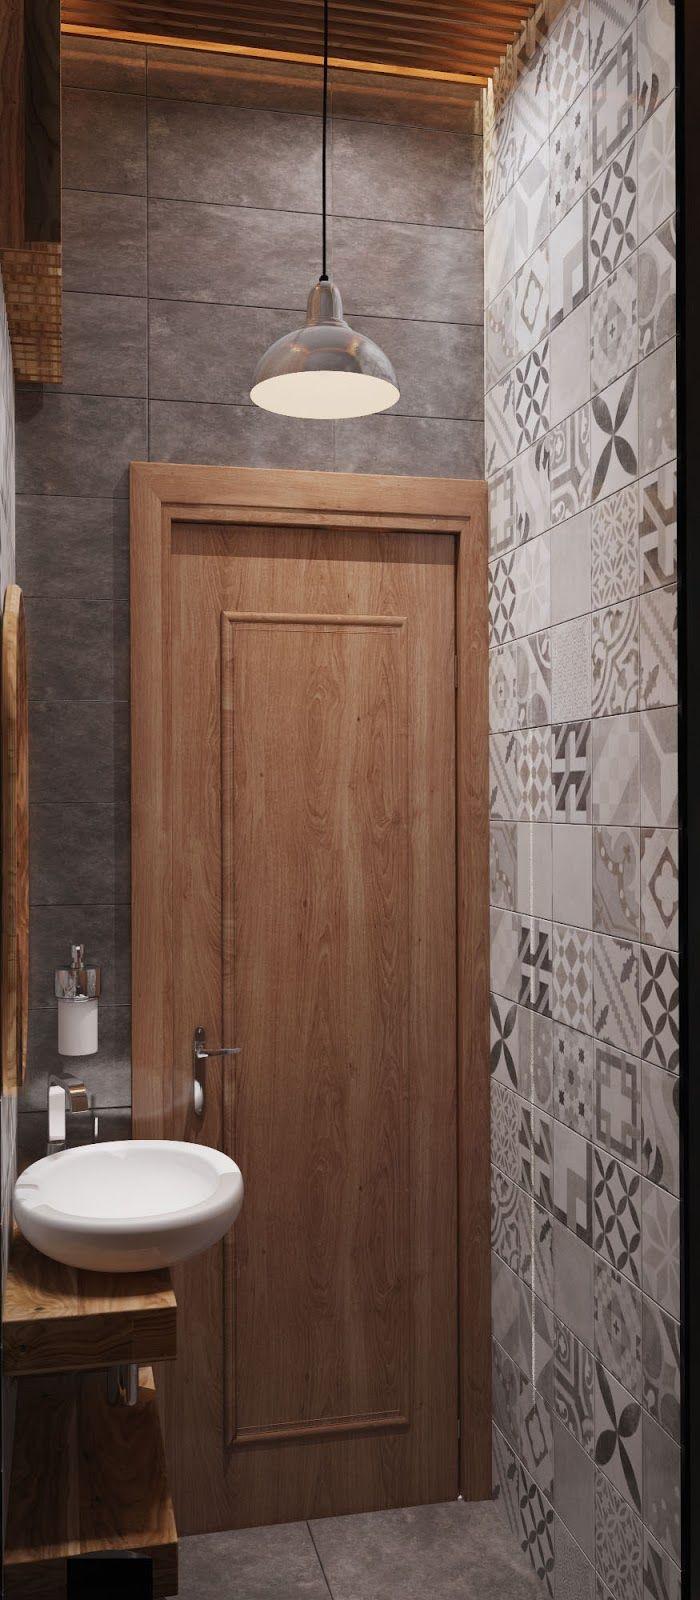 Projects dise o de restaurante en madera y aguamarina virlova style interiorismo en 2018 - Virlova style ...